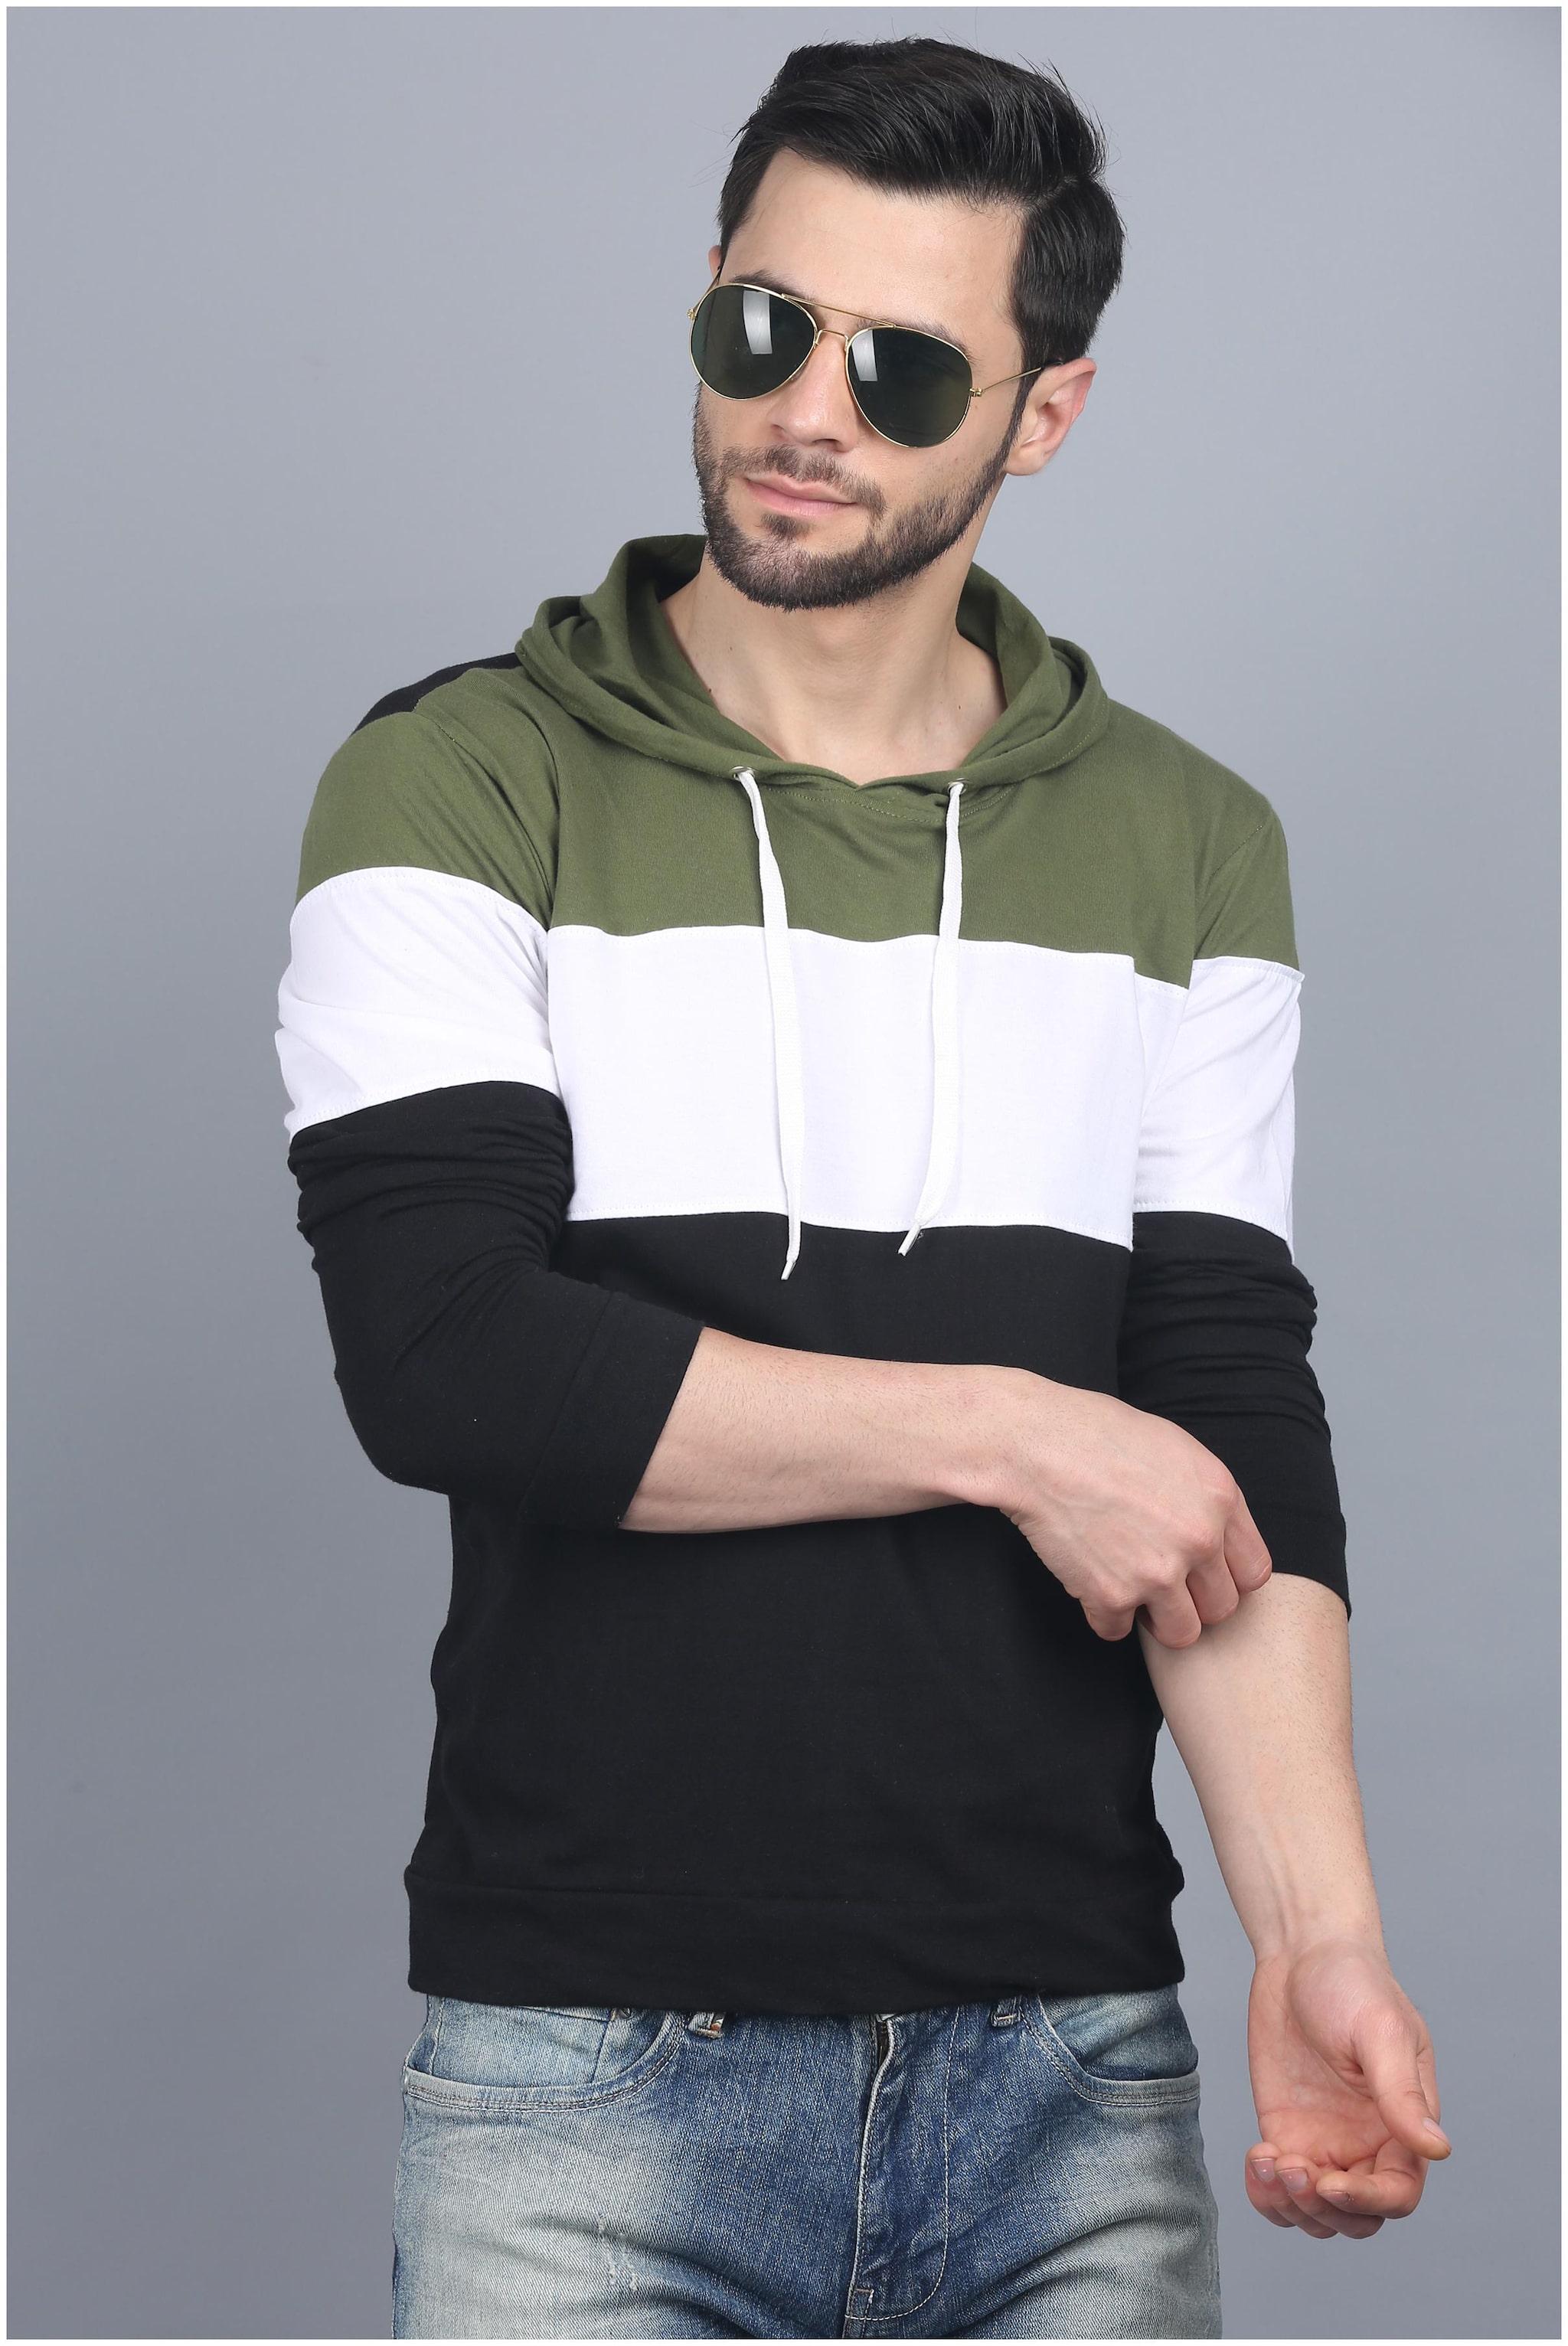 New York Print Pull Over Hooded Fleece Tracksuit  Mens Size